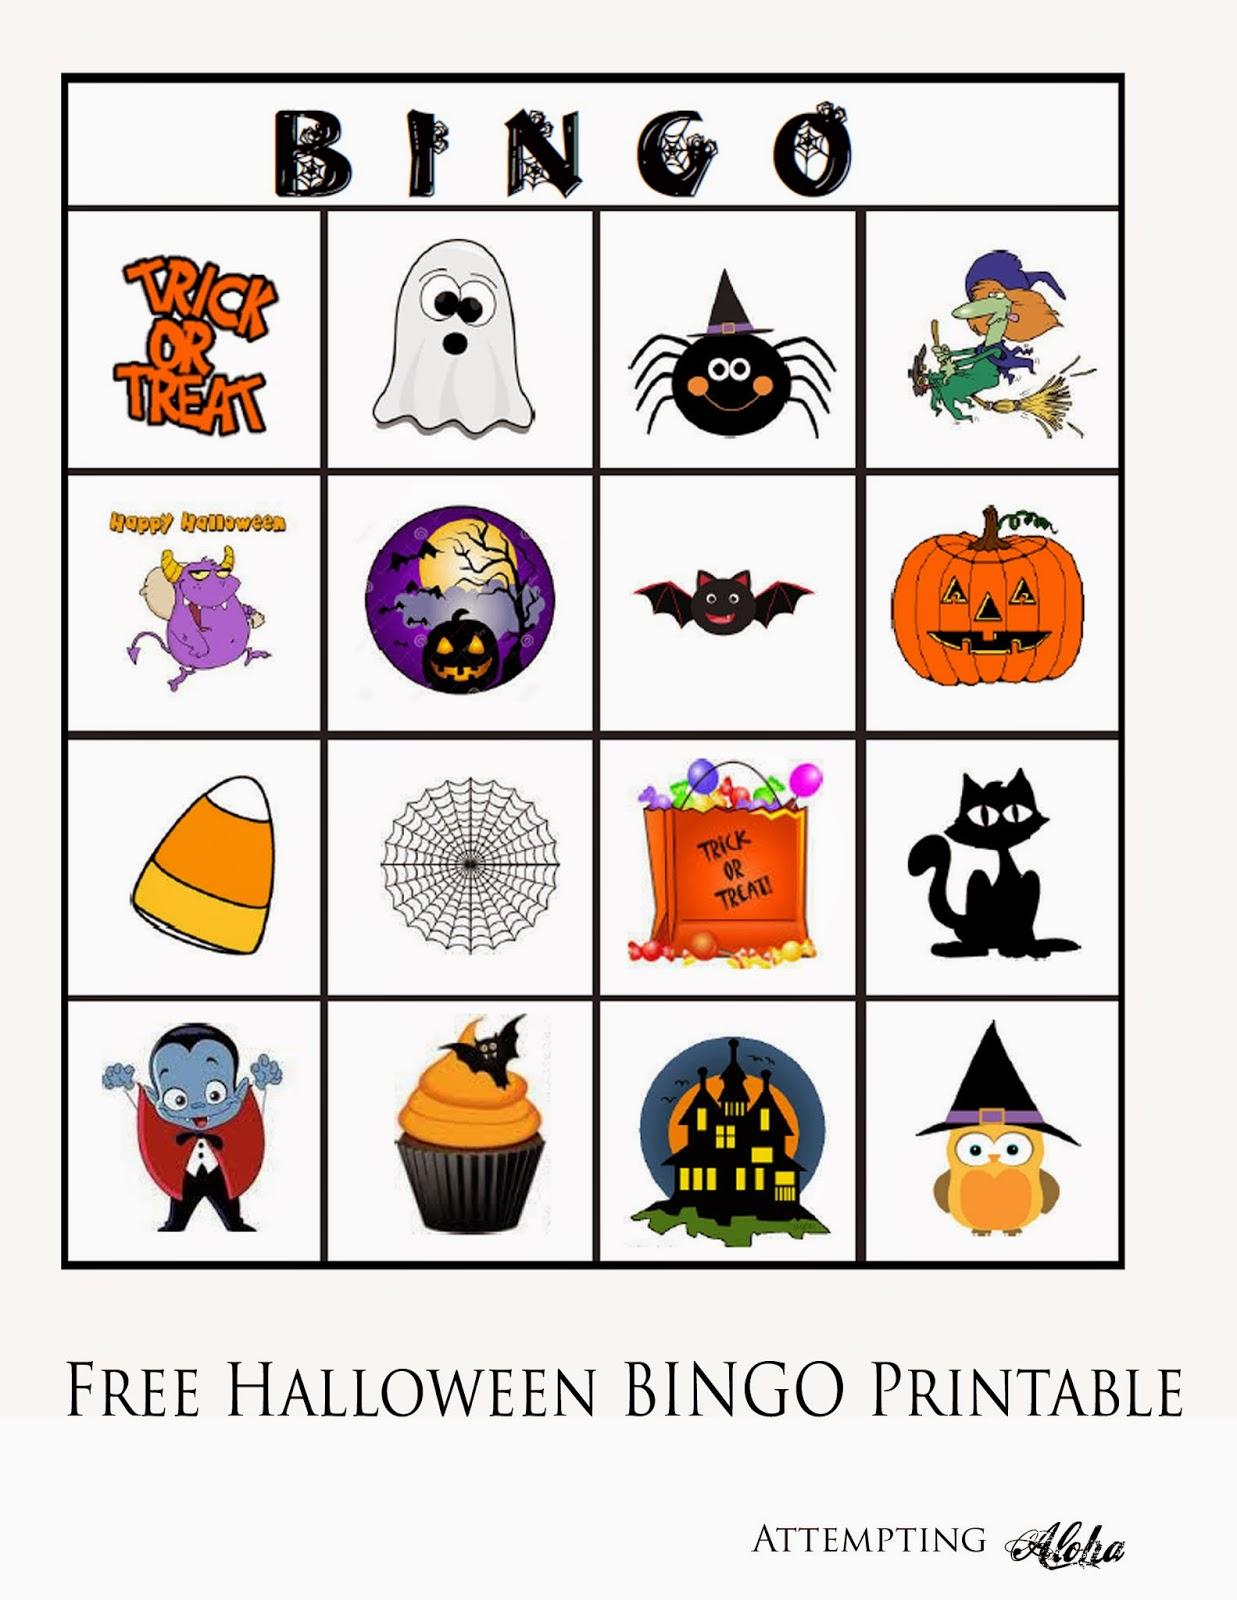 Attempting aloha free printable. Bingo clipart halloween